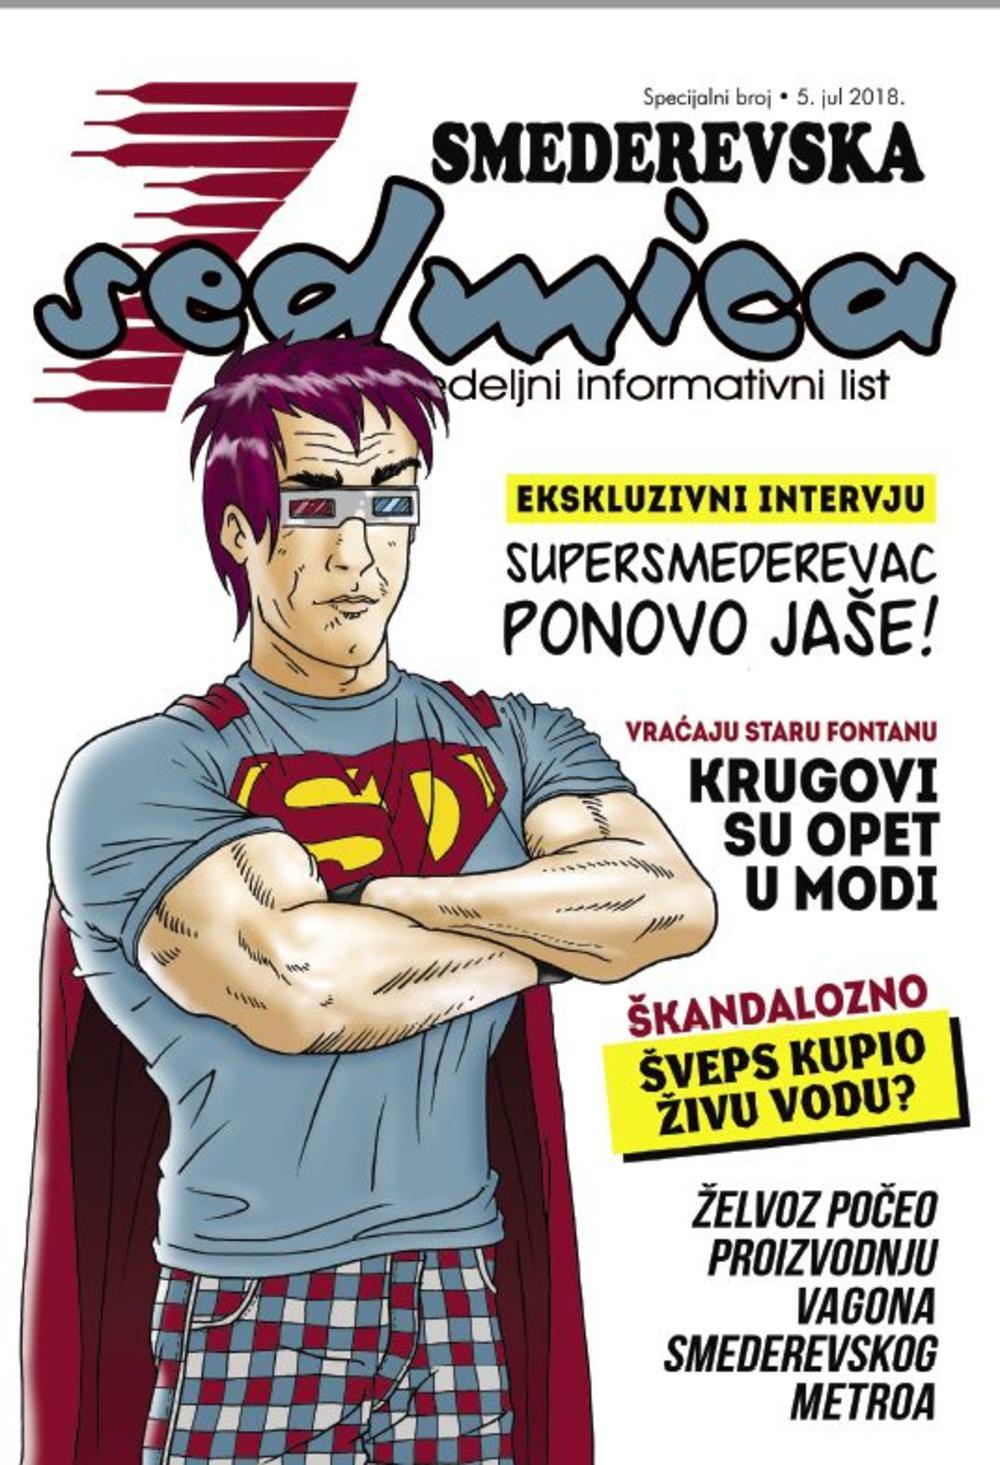 foto: Supersmederevac, Ivan Tobić, Miloš Trajković Buci